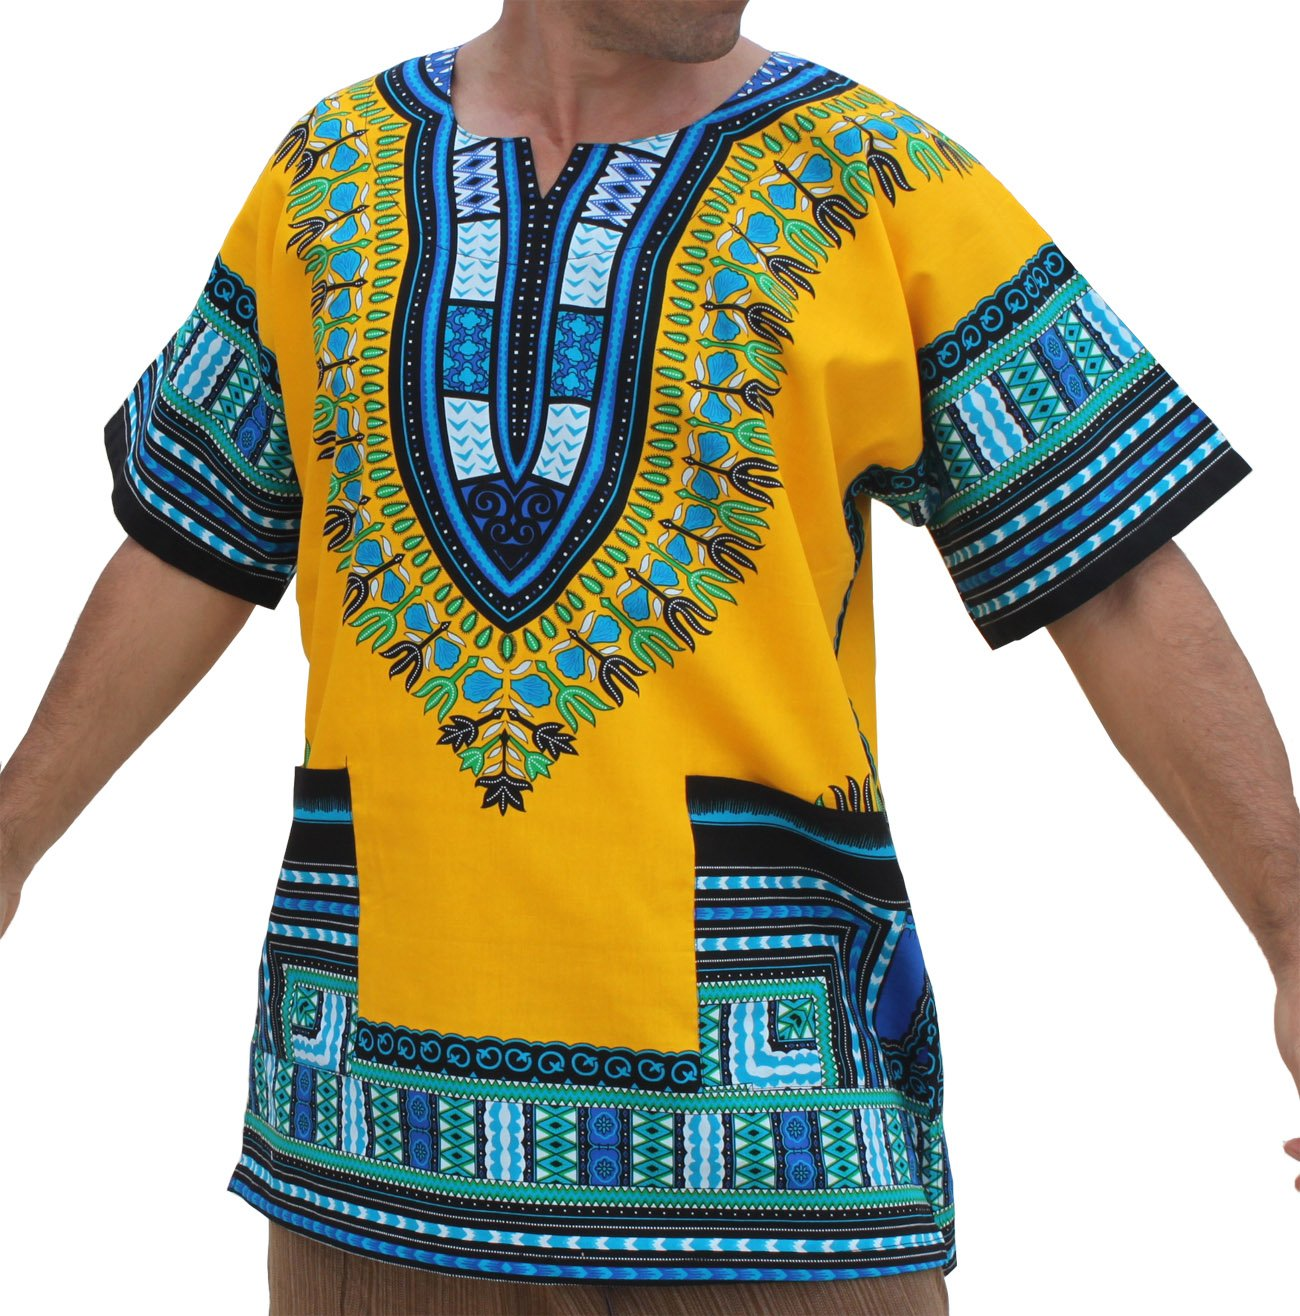 RaanPahMuang Unisex African Bright Dashiki Cotton Shirt Variety Colors, Medium, Yellow - Multi-coloured